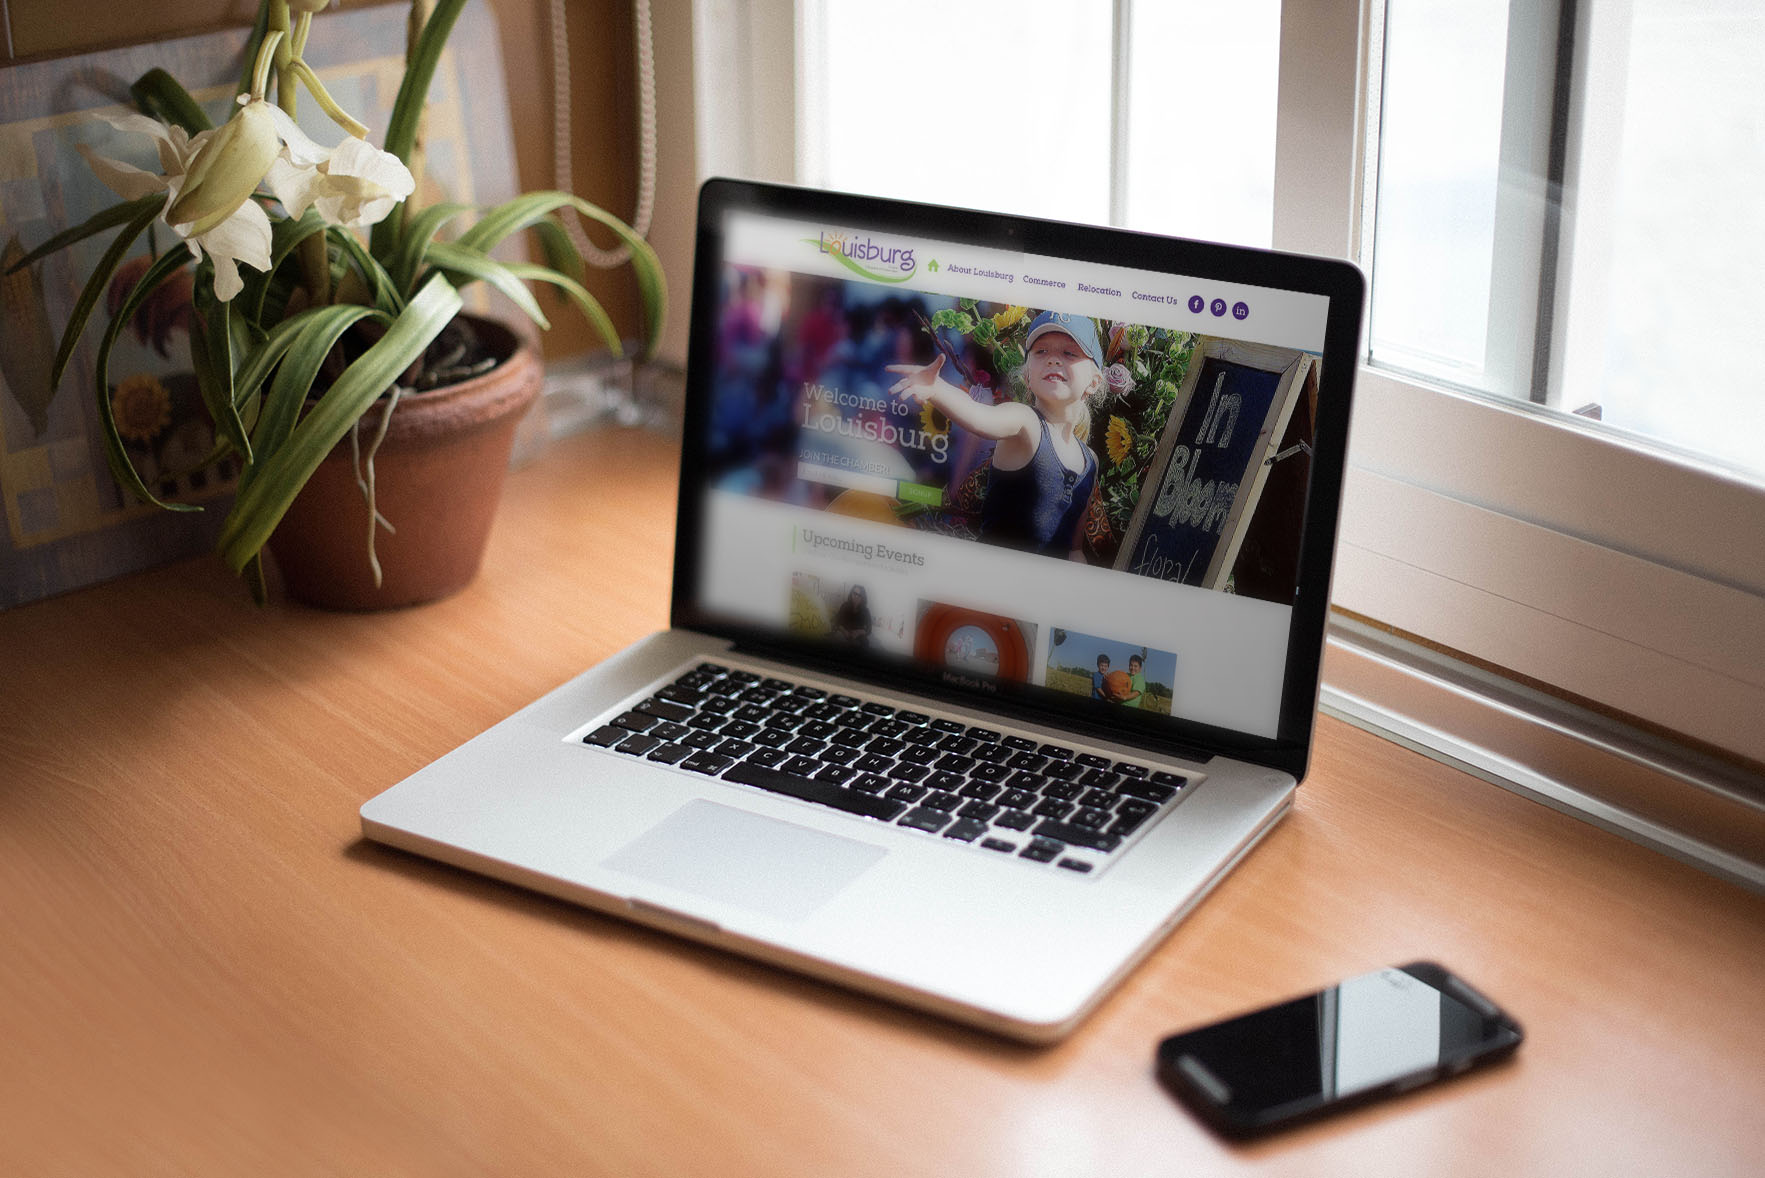 Clean website with good design